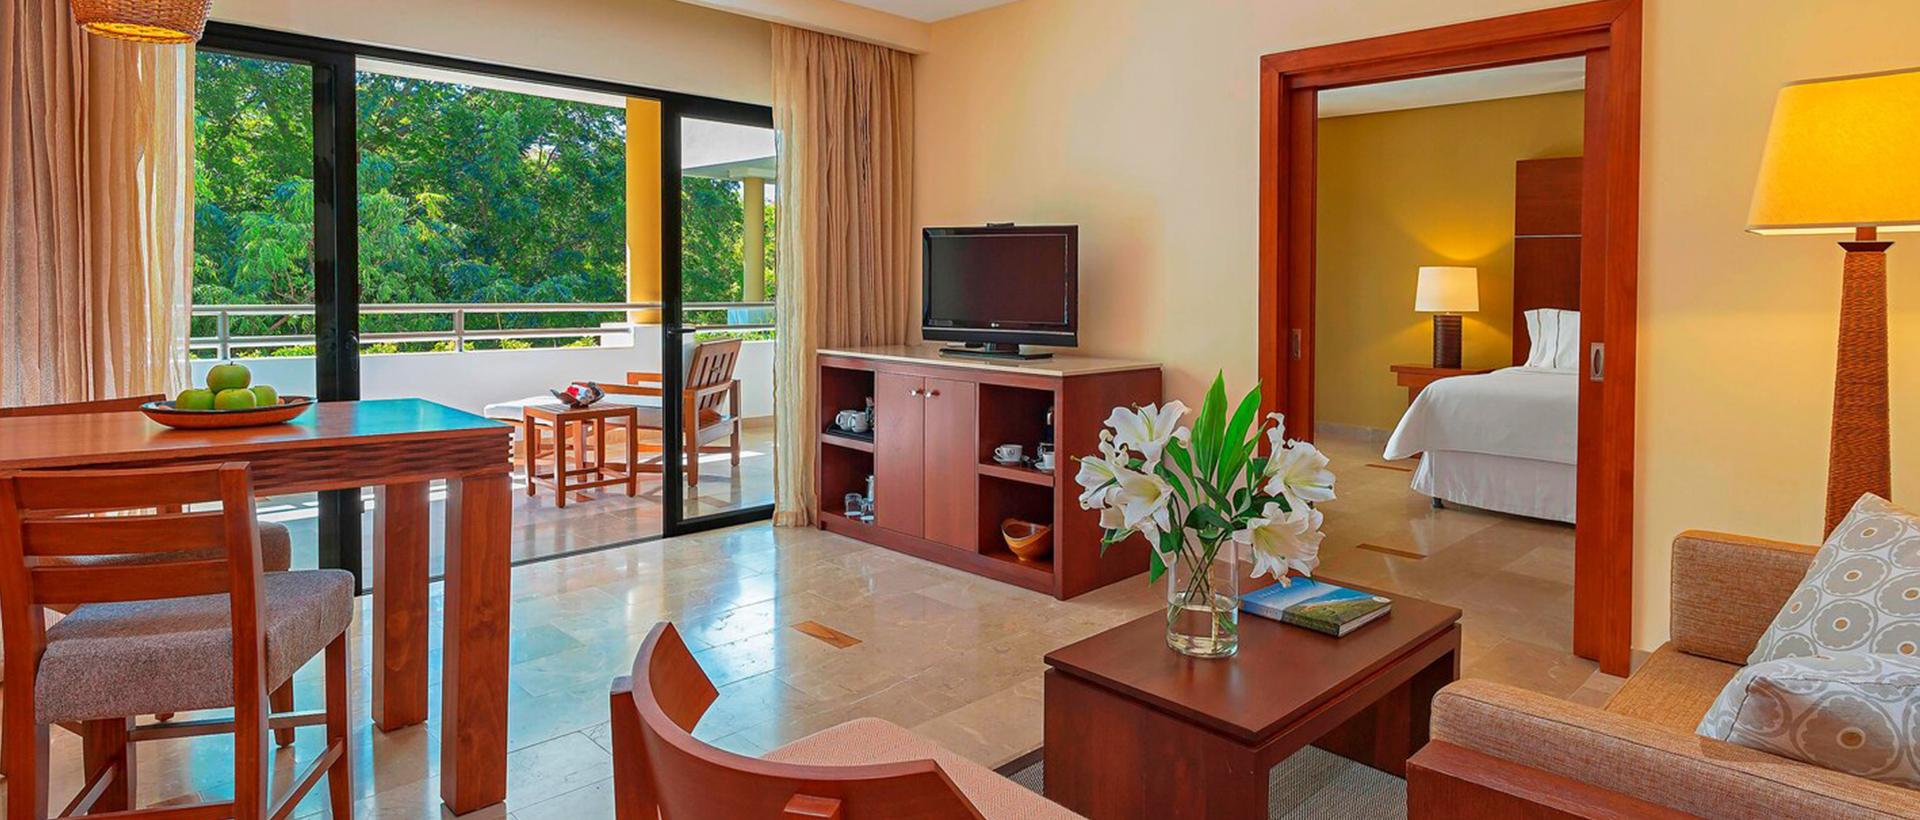 Rooms & Suites The Westin Reserva